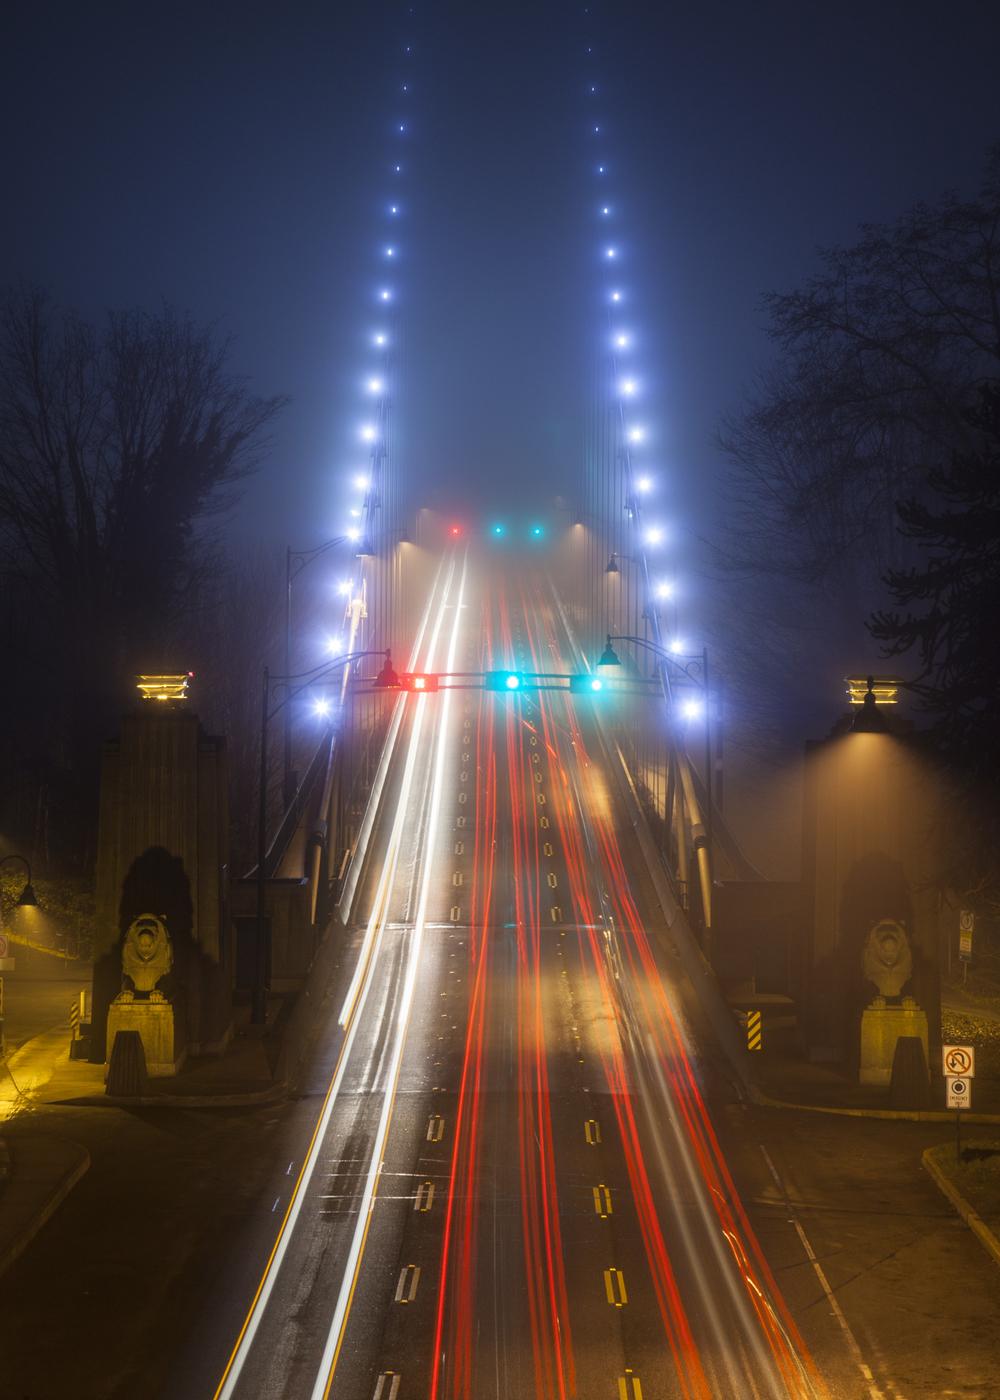 2012 02 Fog-5.jpg